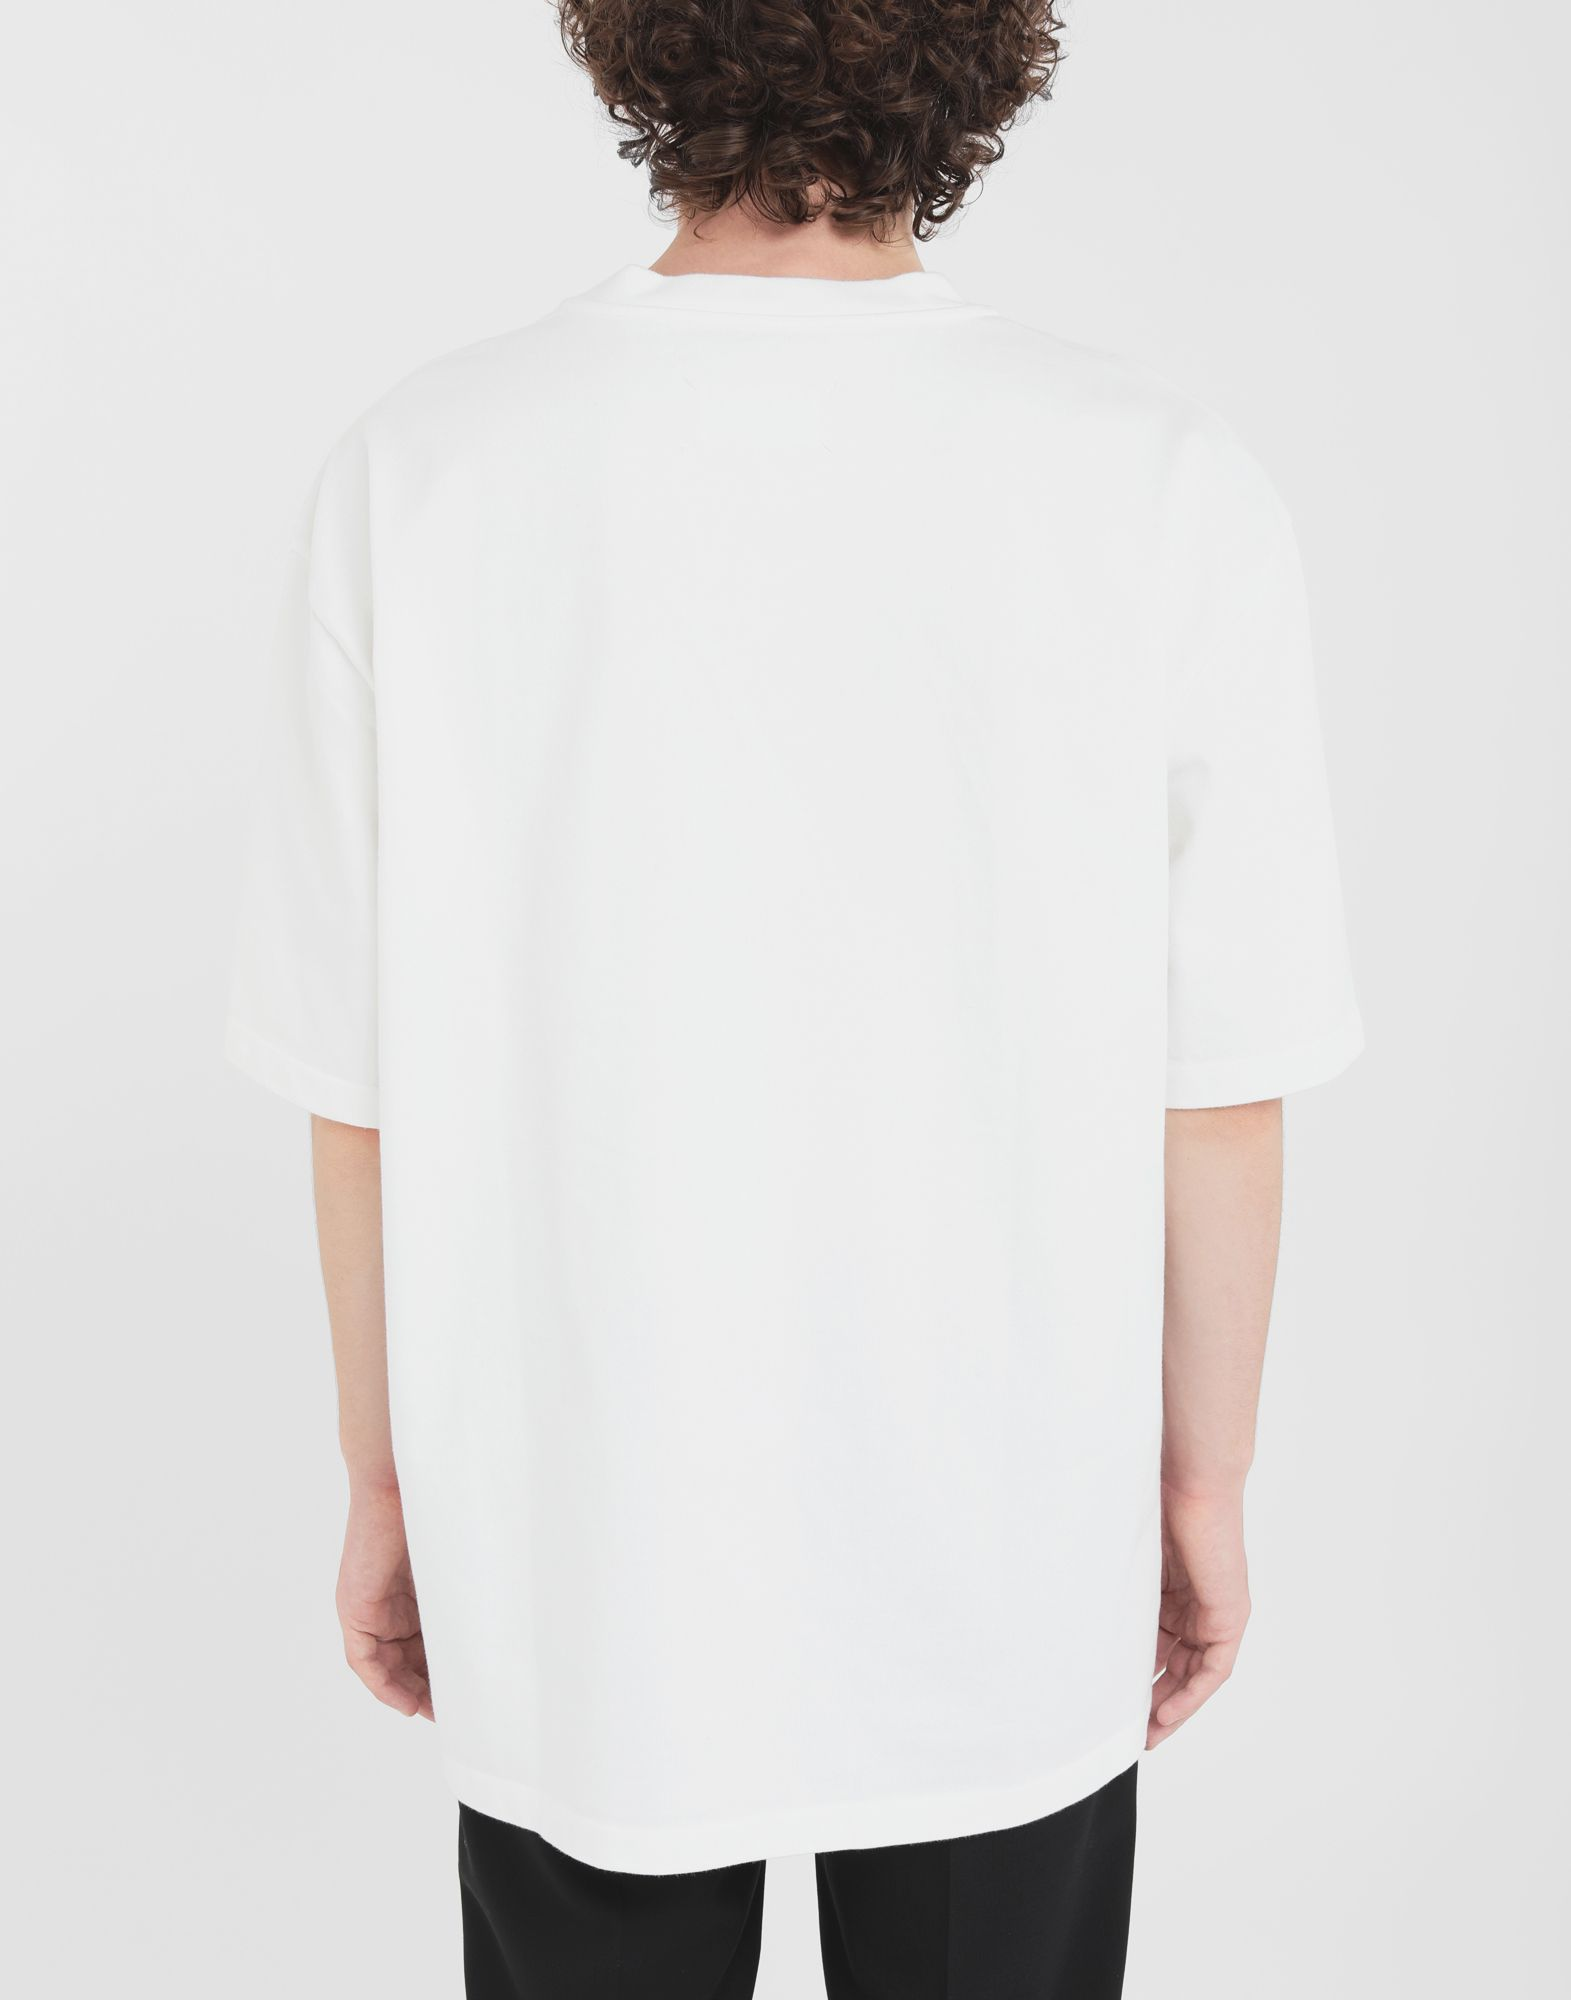 MAISON MARGIELA 'Caution' Tシャツ  T シャツ メンズ e